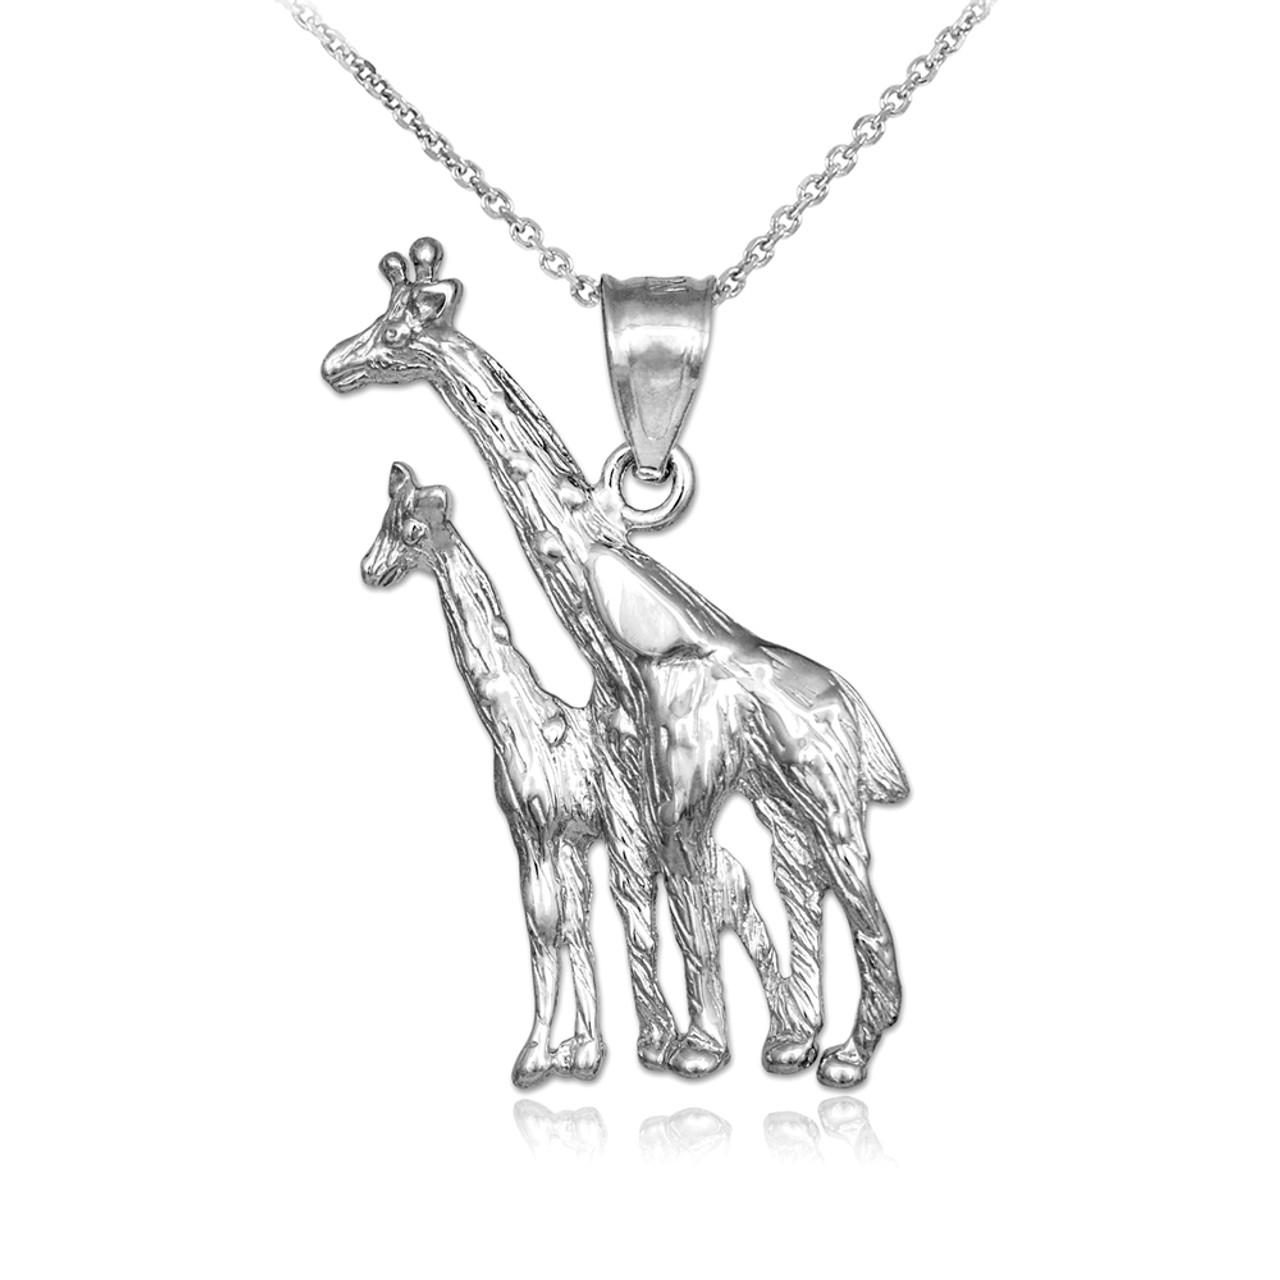 White gold giraffe pendant white gold giraffe pendant necklace aloadofball Image collections